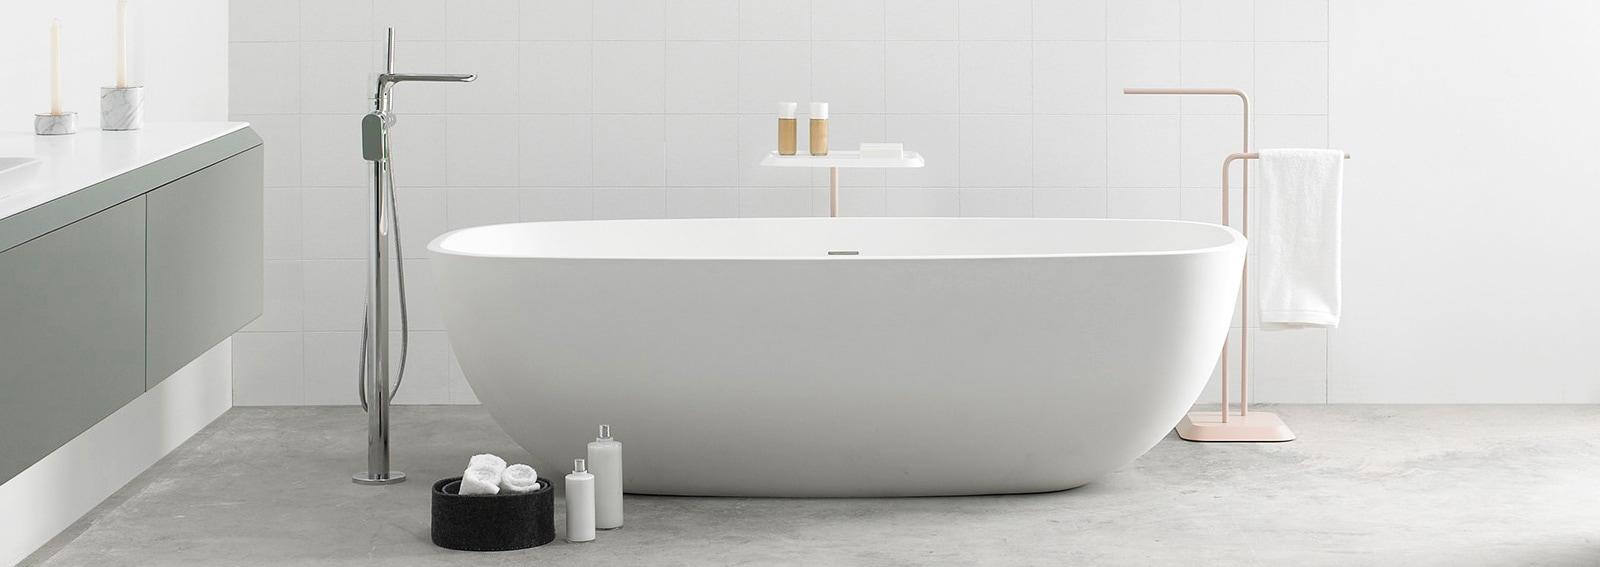 cover-volete-una-spa-in-casa-desktop